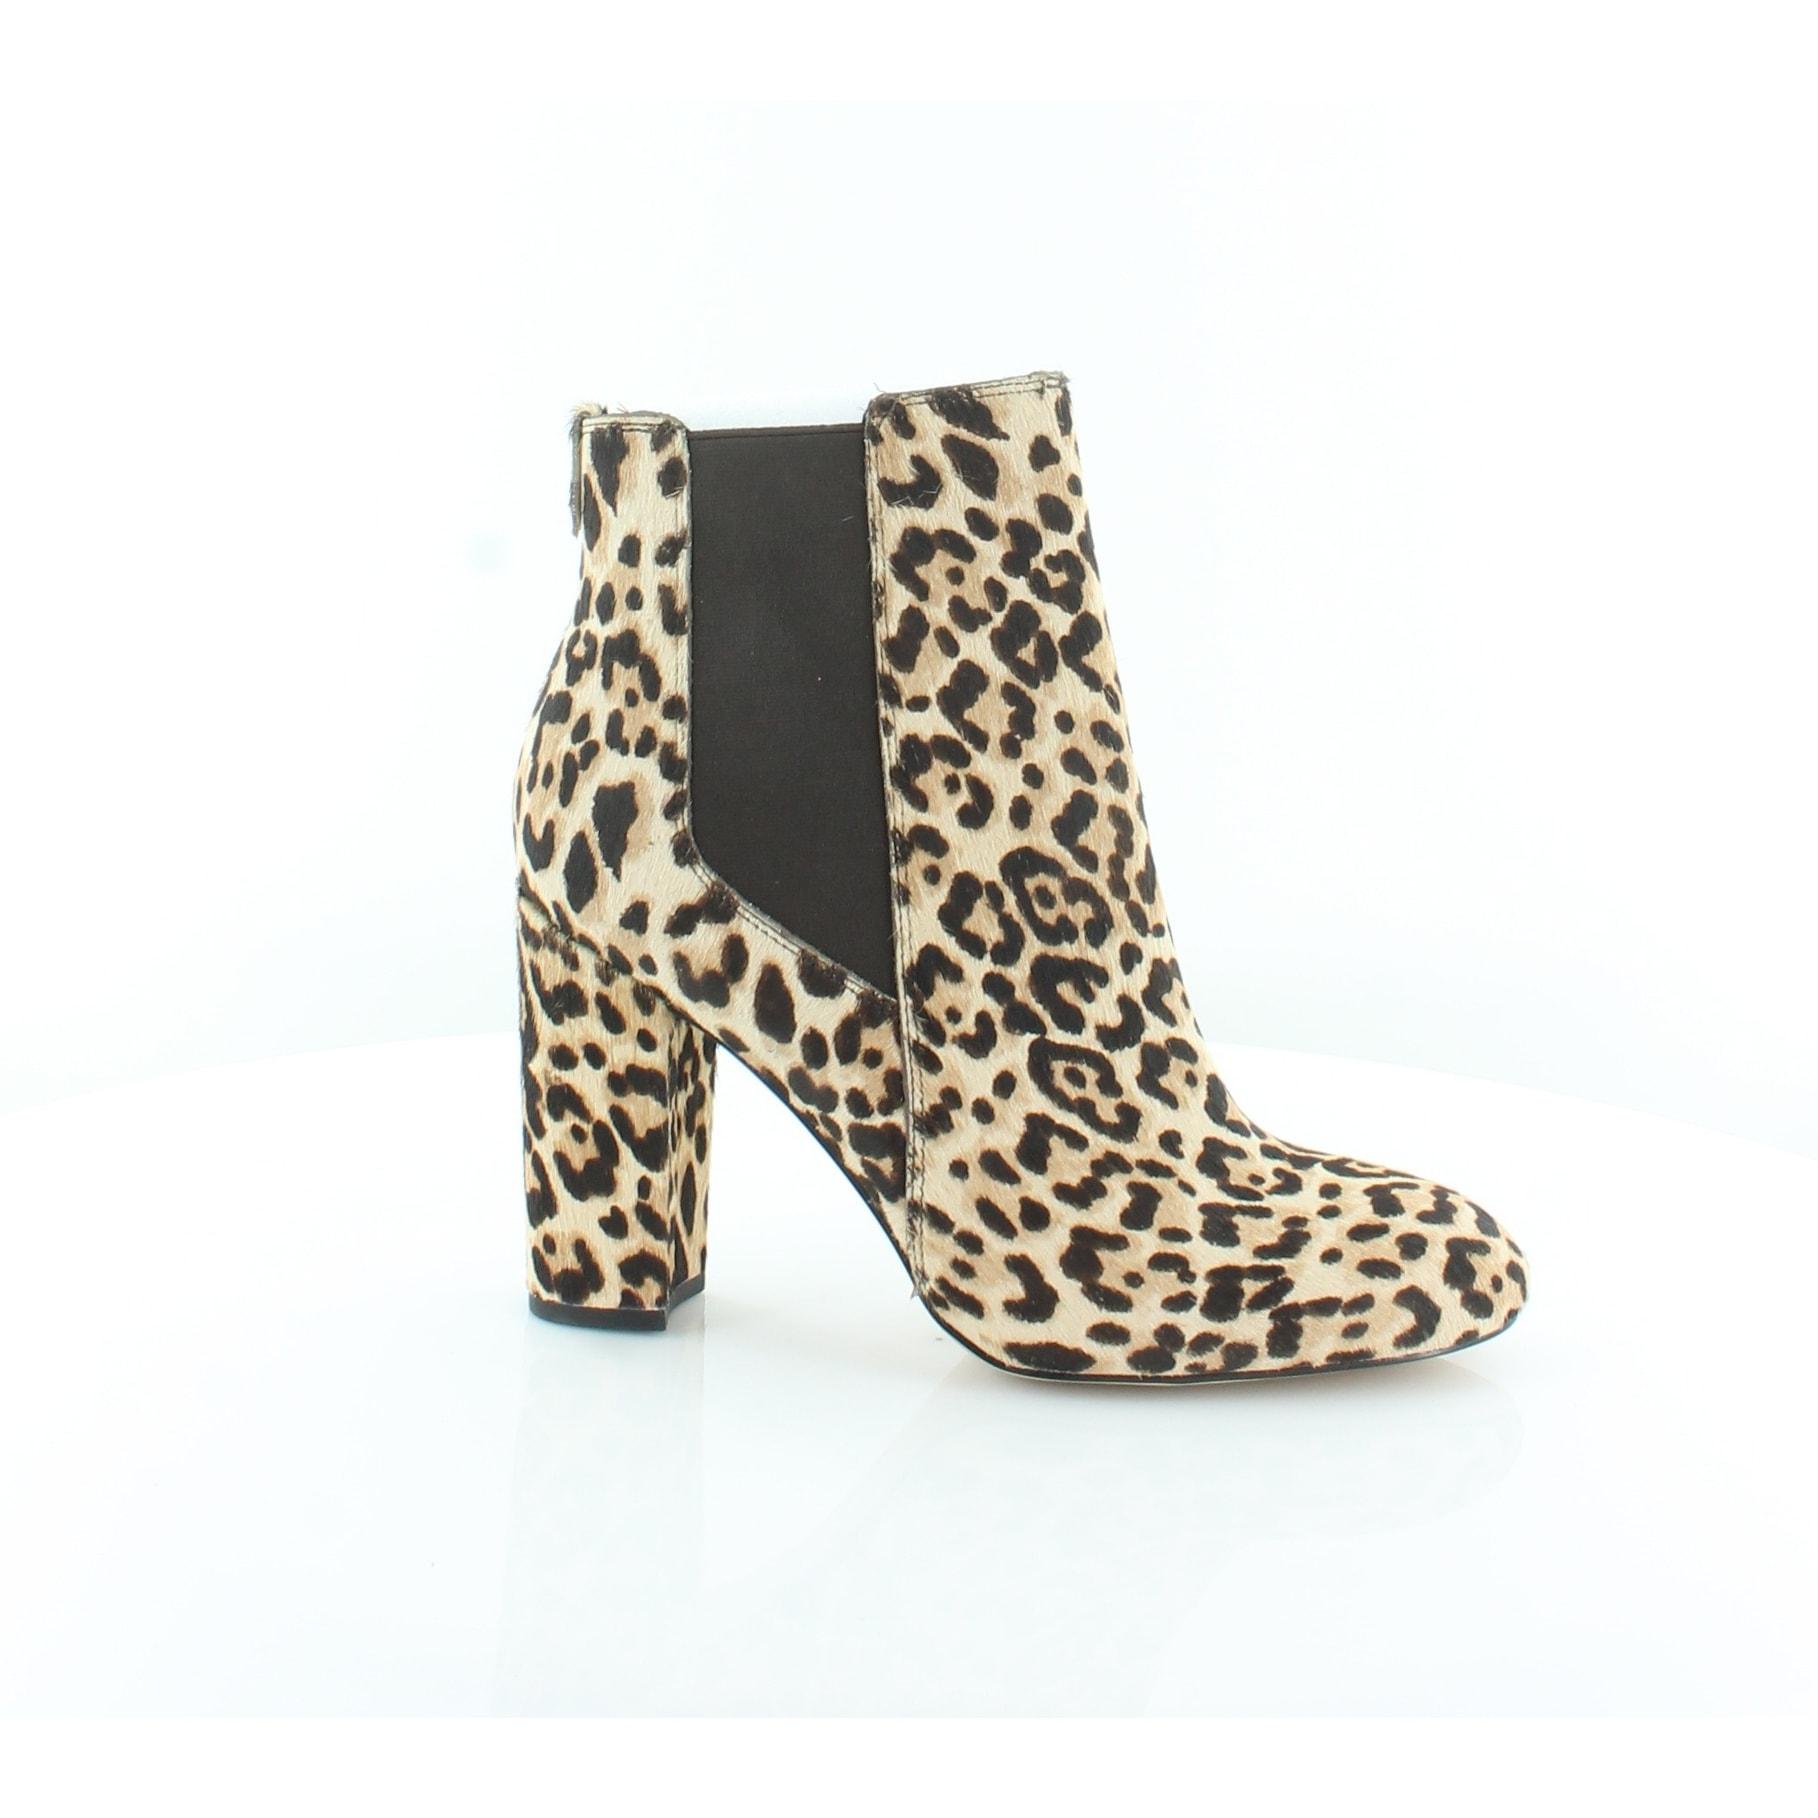 862d0f67d Shop Sam Edelman Case Women s Boots Sand Leop - Free Shipping Today ...